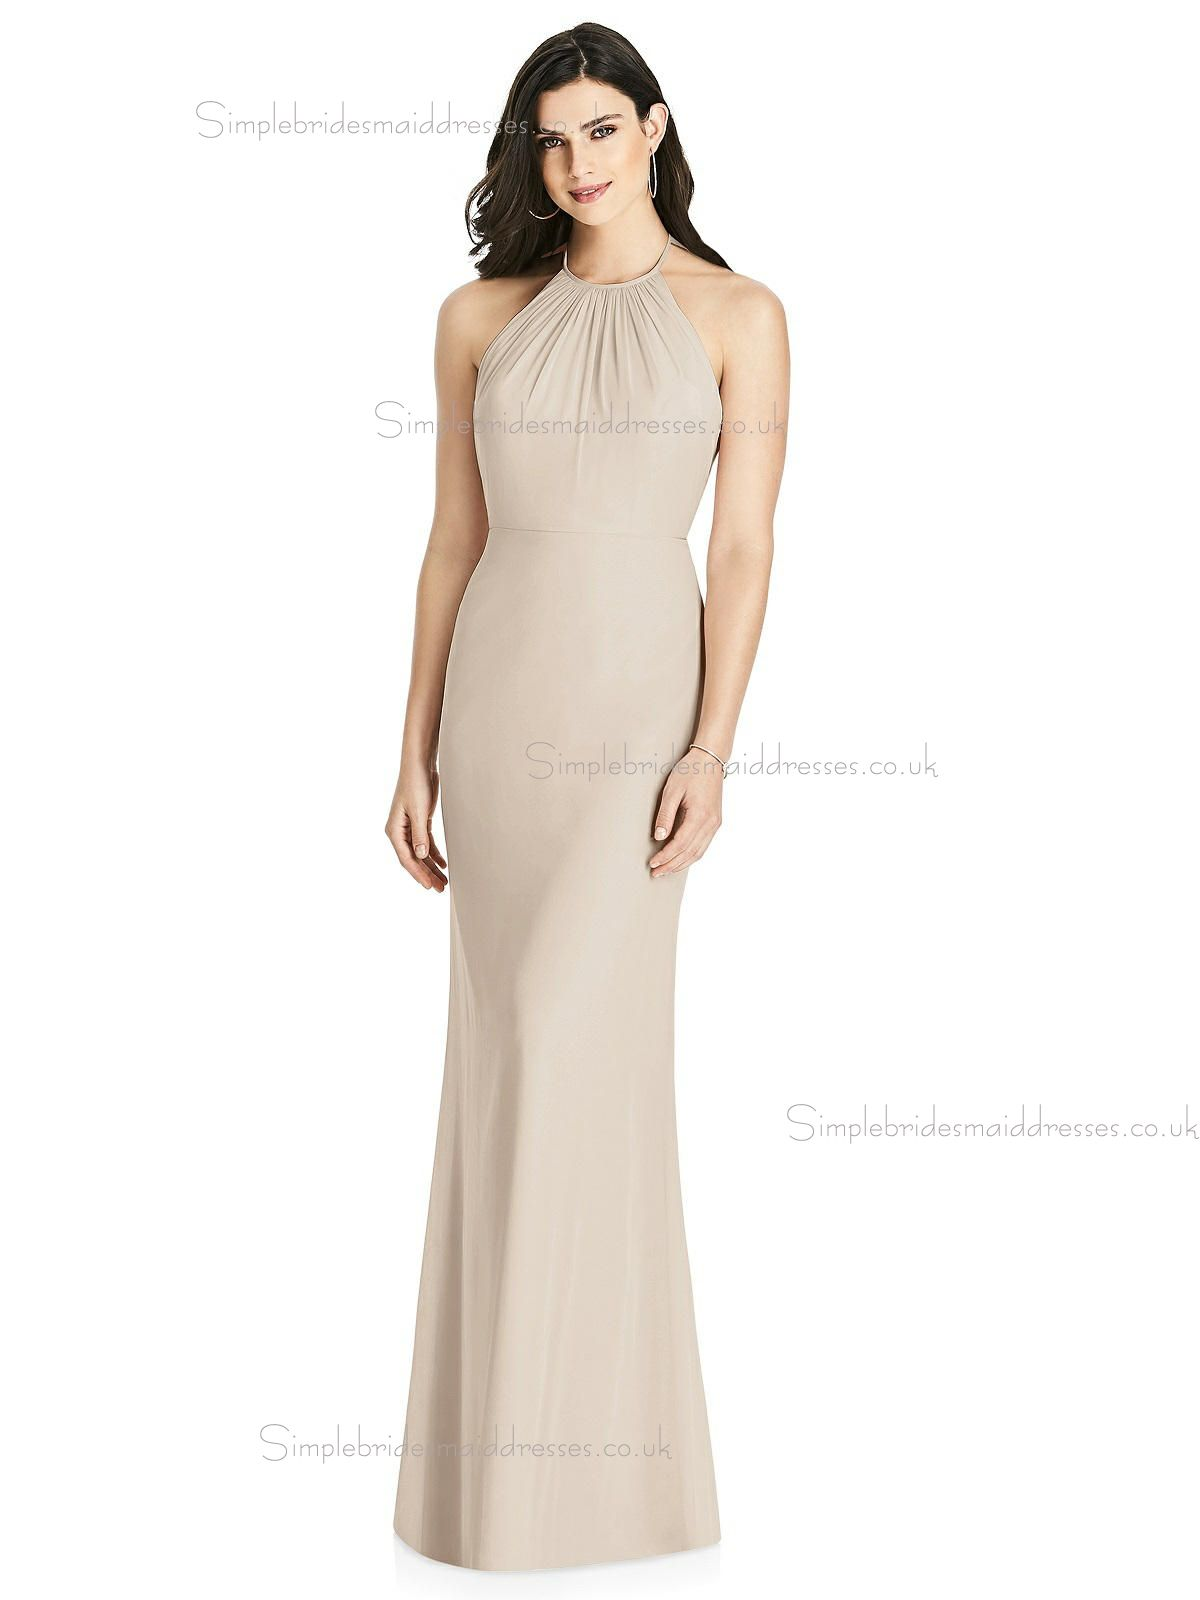 Pin On 2018 Hot Sale Bridesmaid Dresses